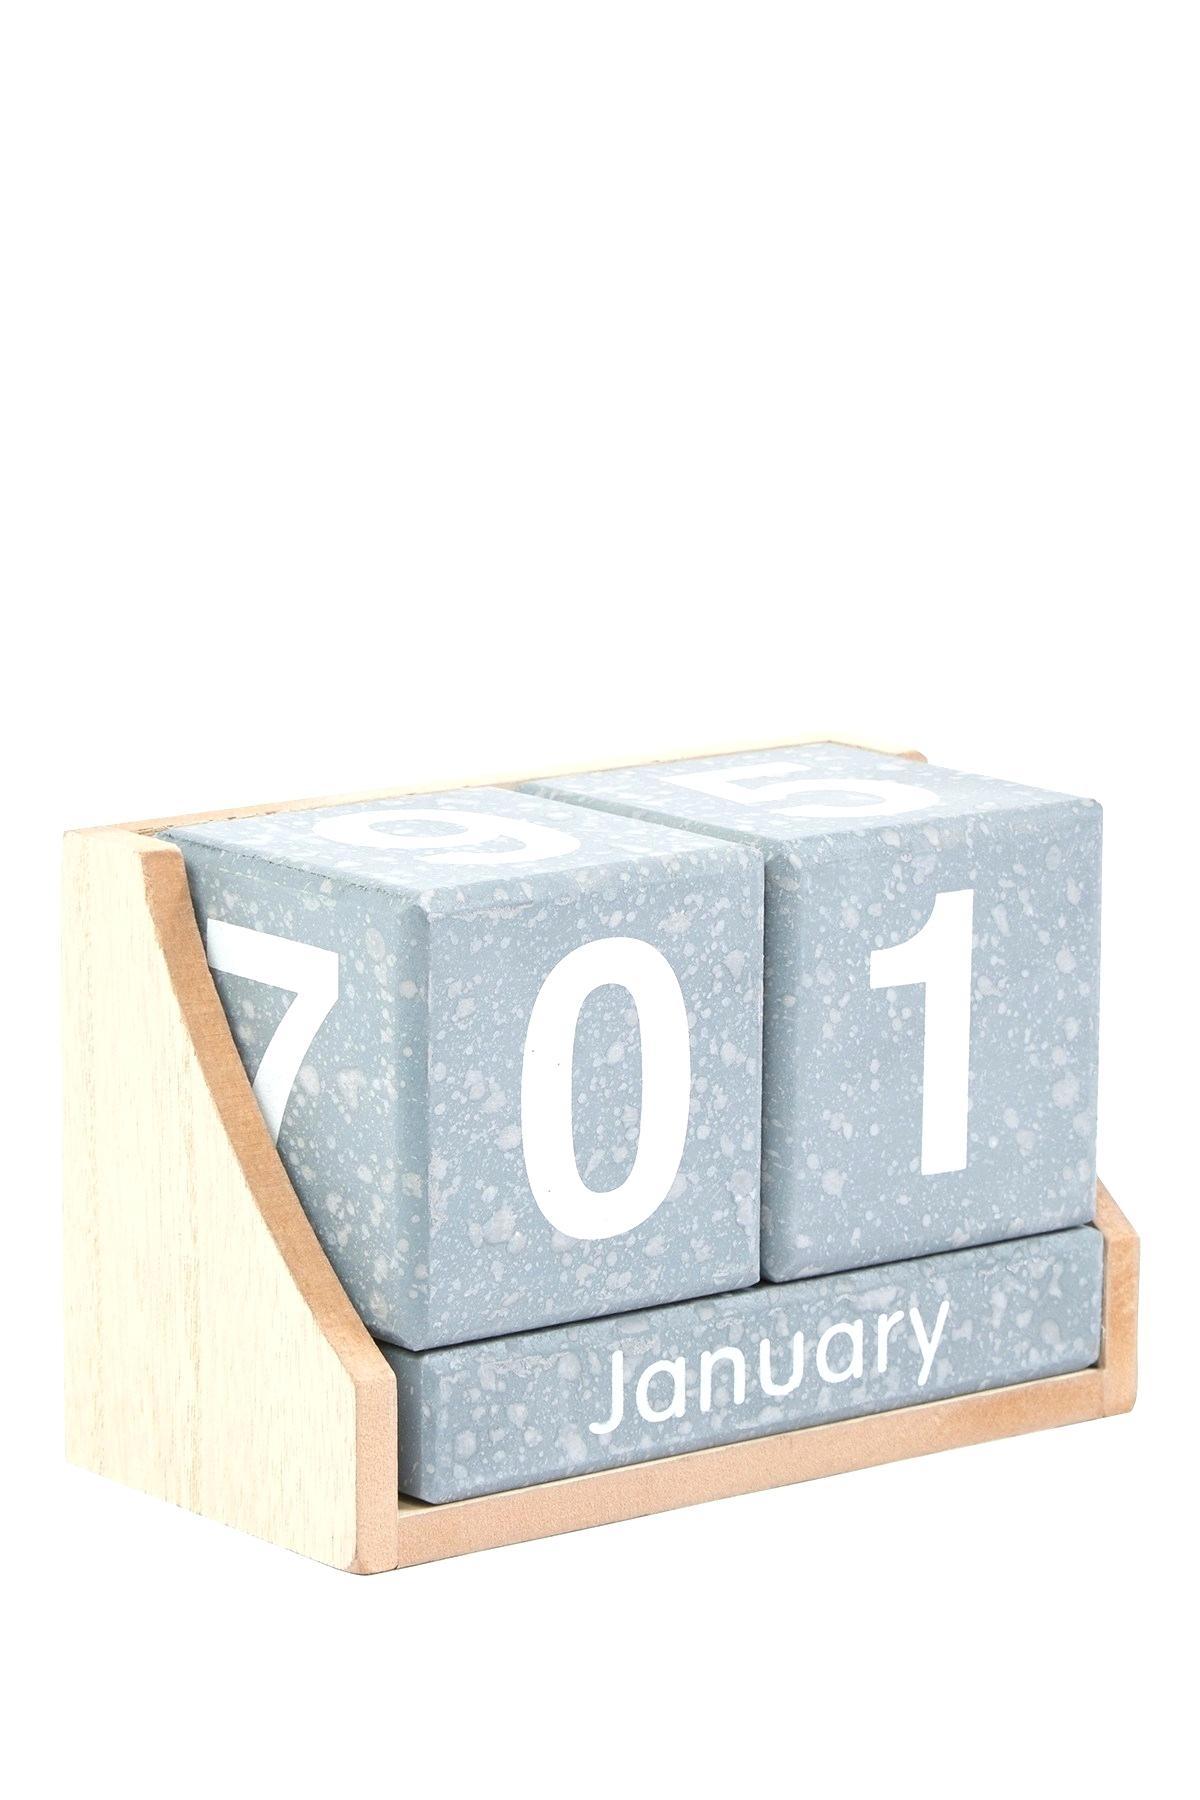 Wall Calendar Frames And Holders  Calendar Inspiration Design for Wall Calendar Frames